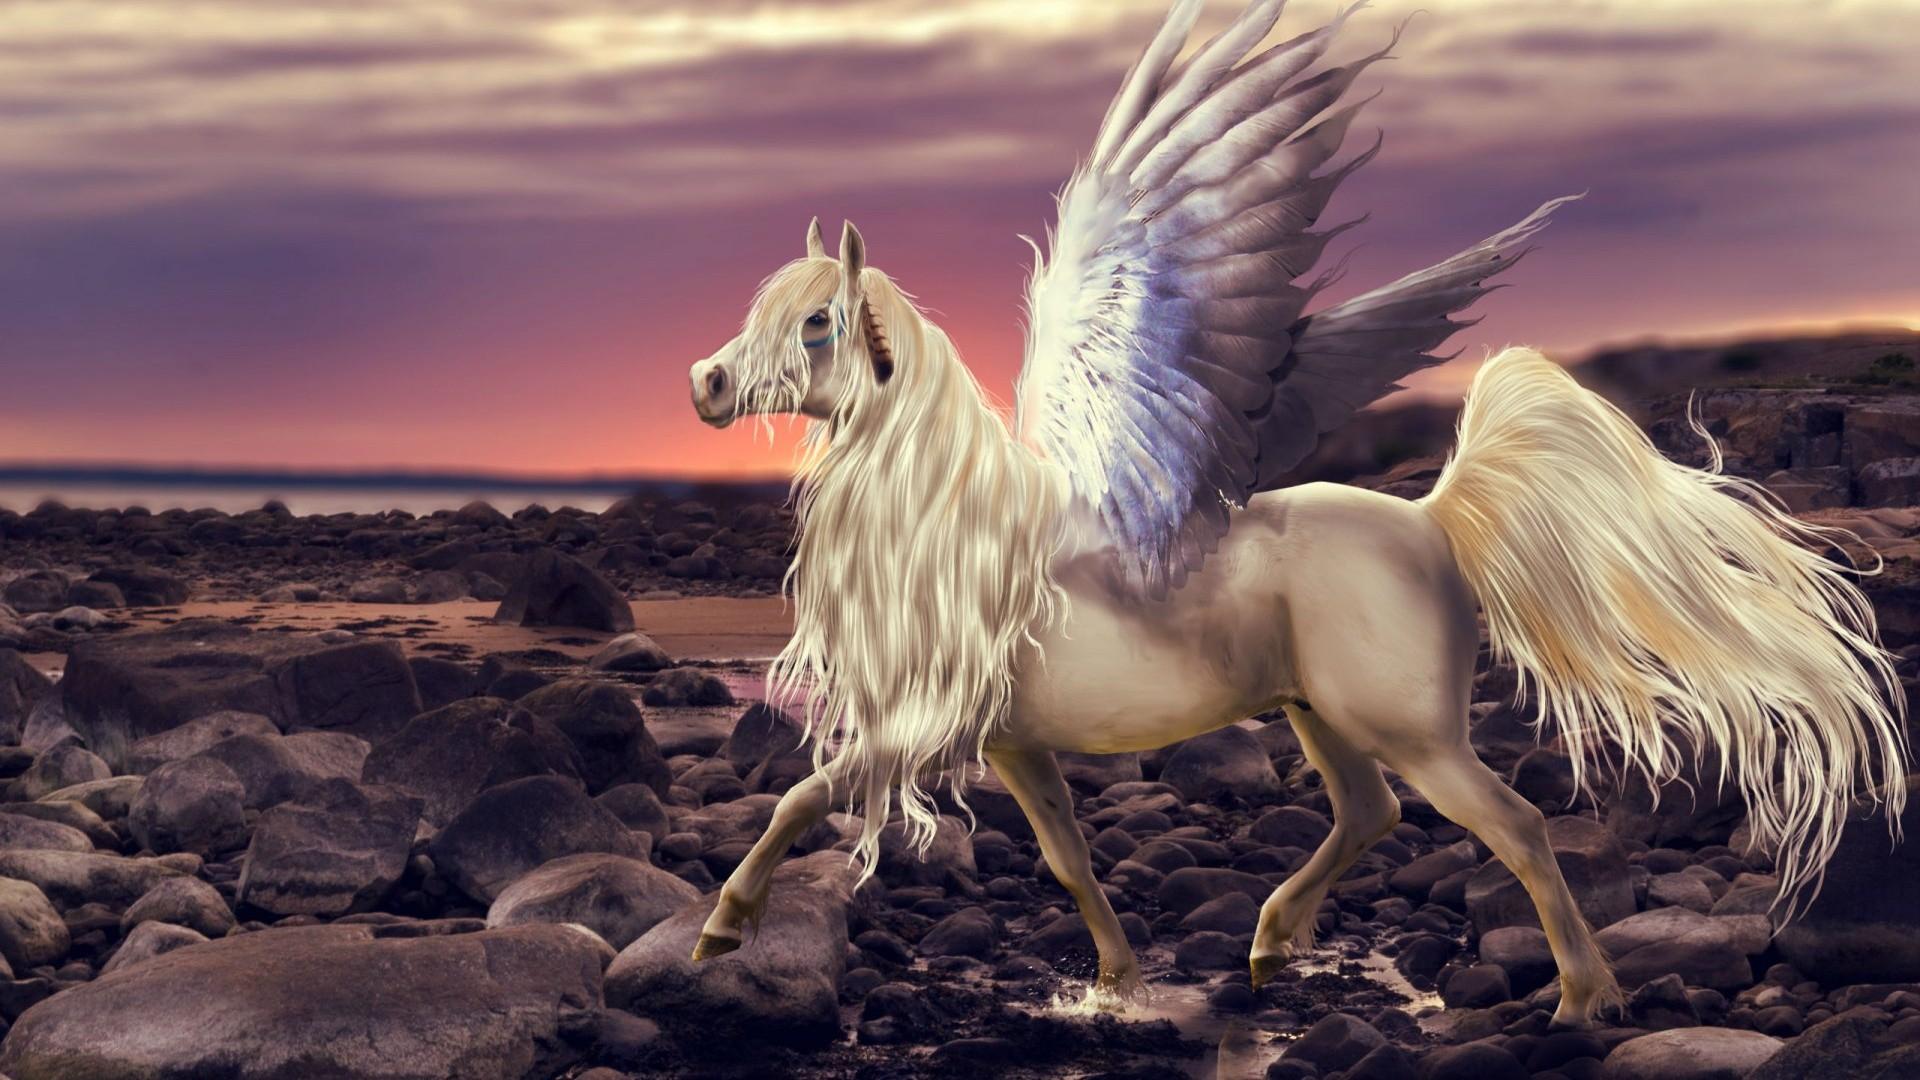 Pegasus wallpaper photo